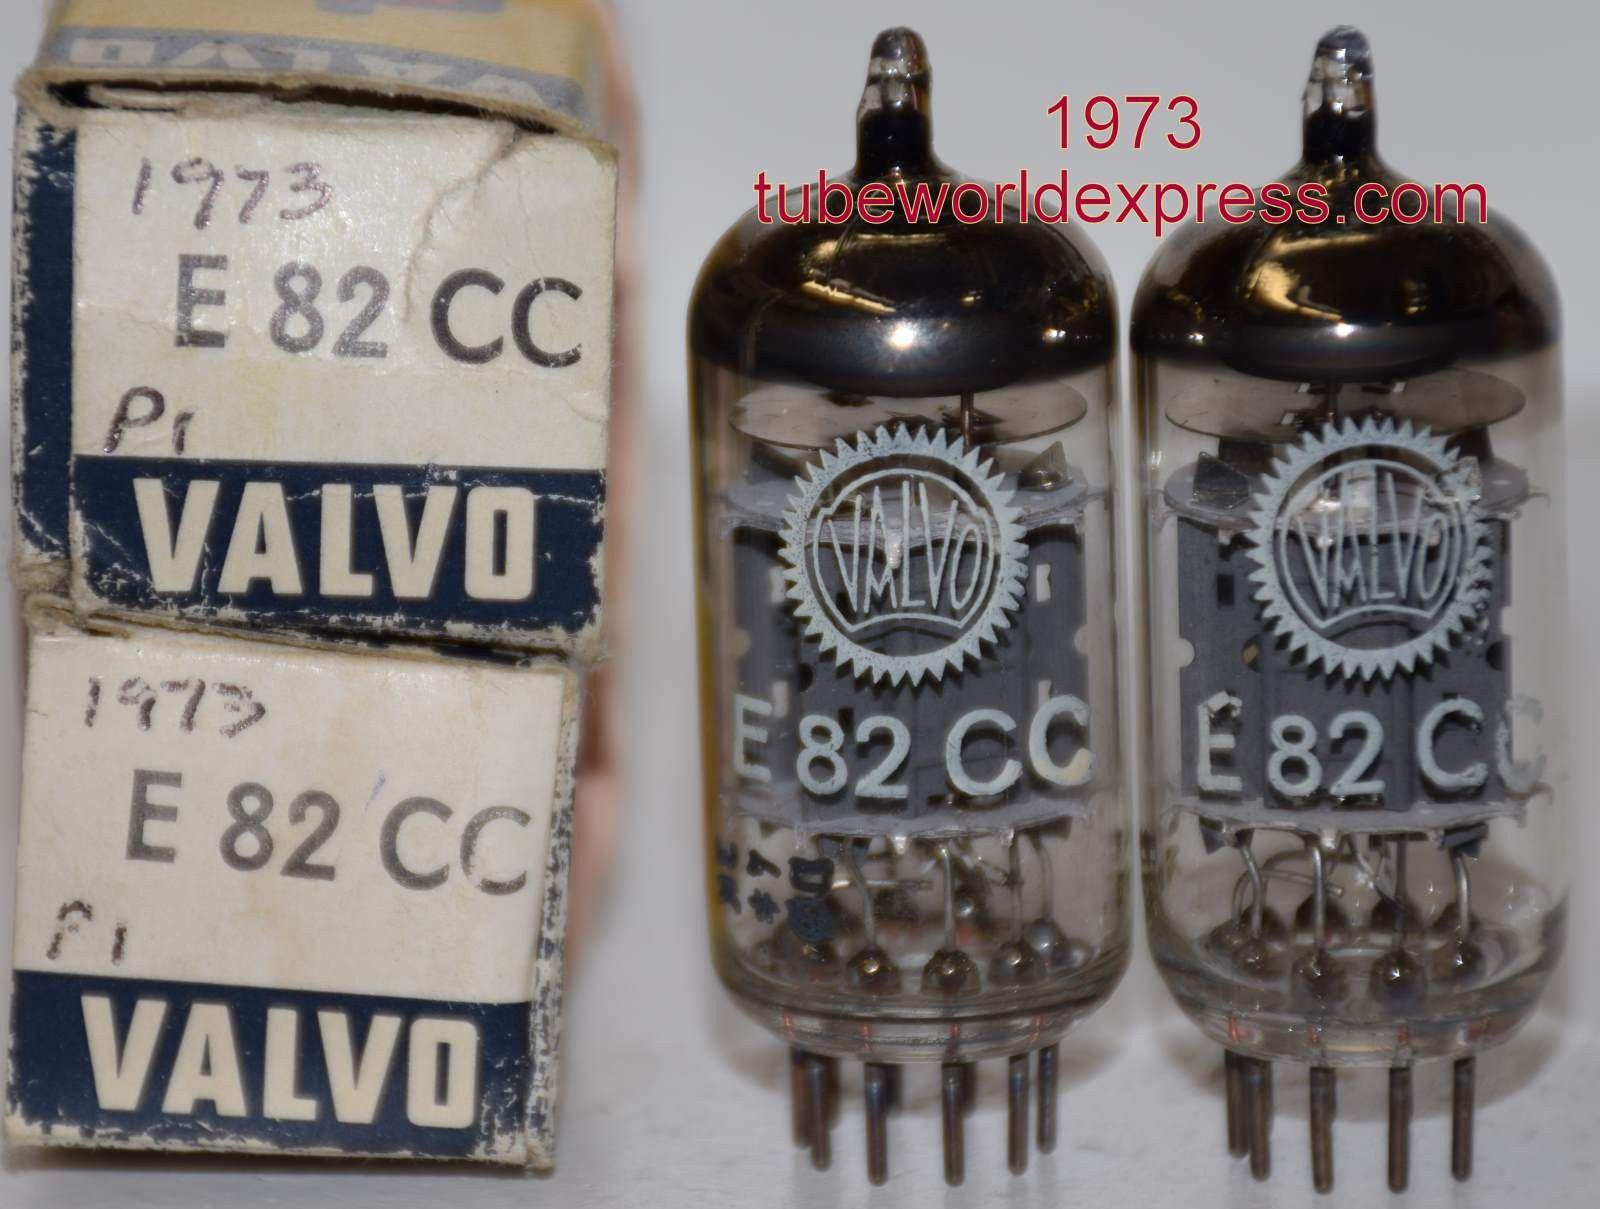 1 E82cc Pair E82cc 12au7wa Siemens Rebranded Valvo Triple Mica Vacuum Tube Vintage Valve Old Radios